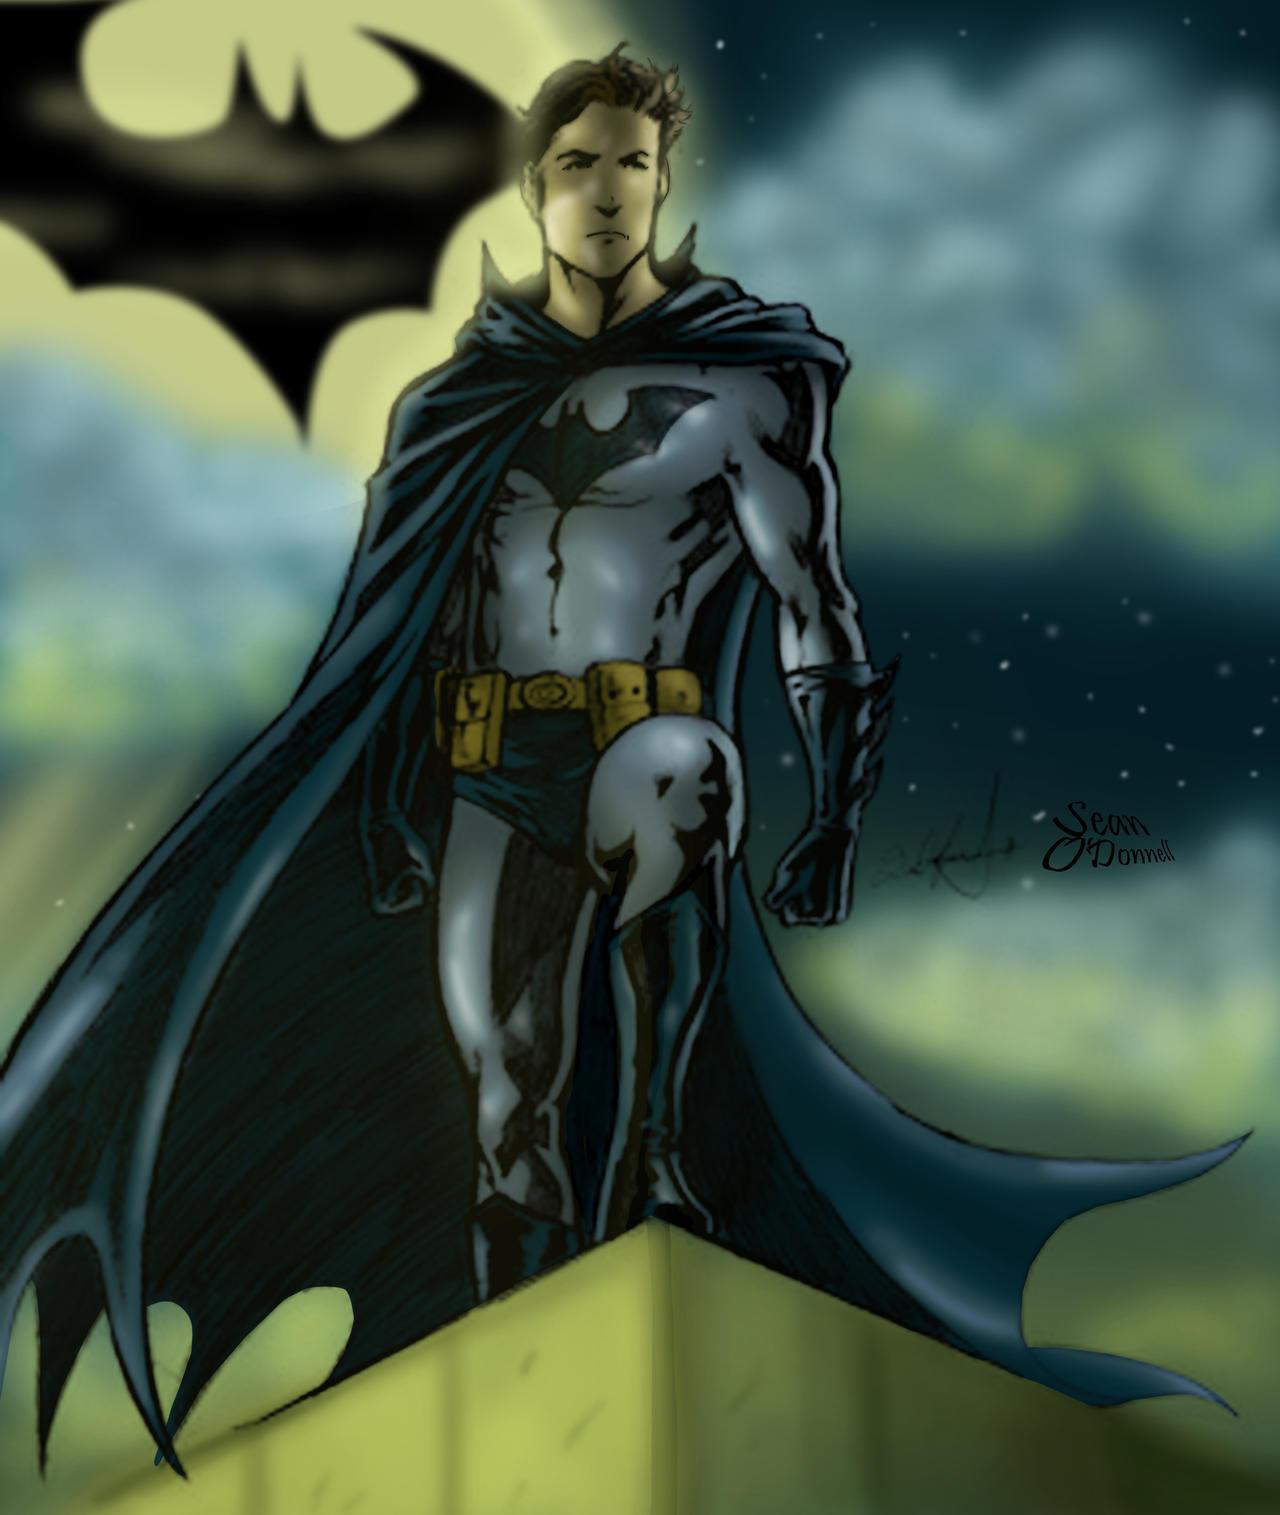 Batman_Unmasked_Commission_by_Sean_Loco_ODonnell.jpg